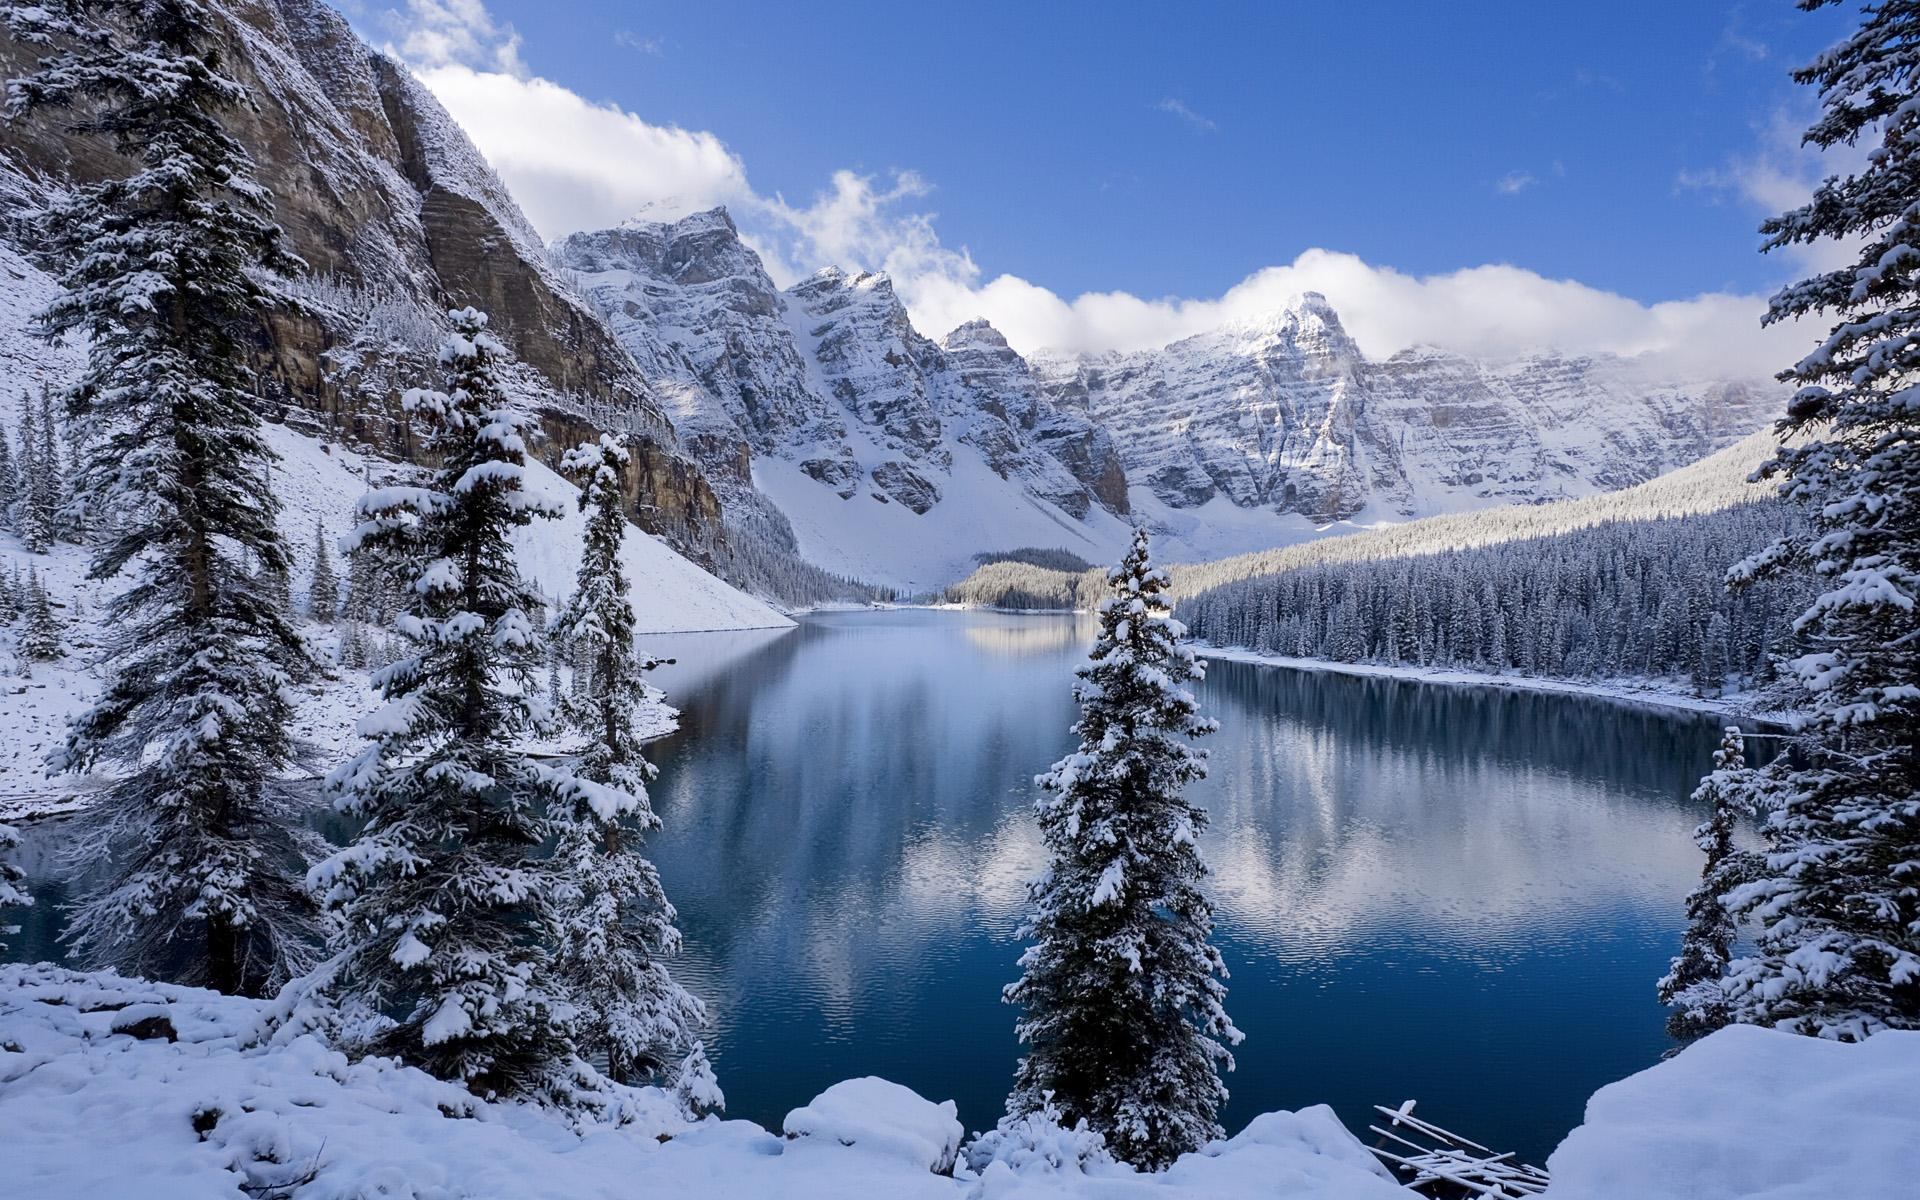 Winter Snow The beautiful winter landscape 1920x1200